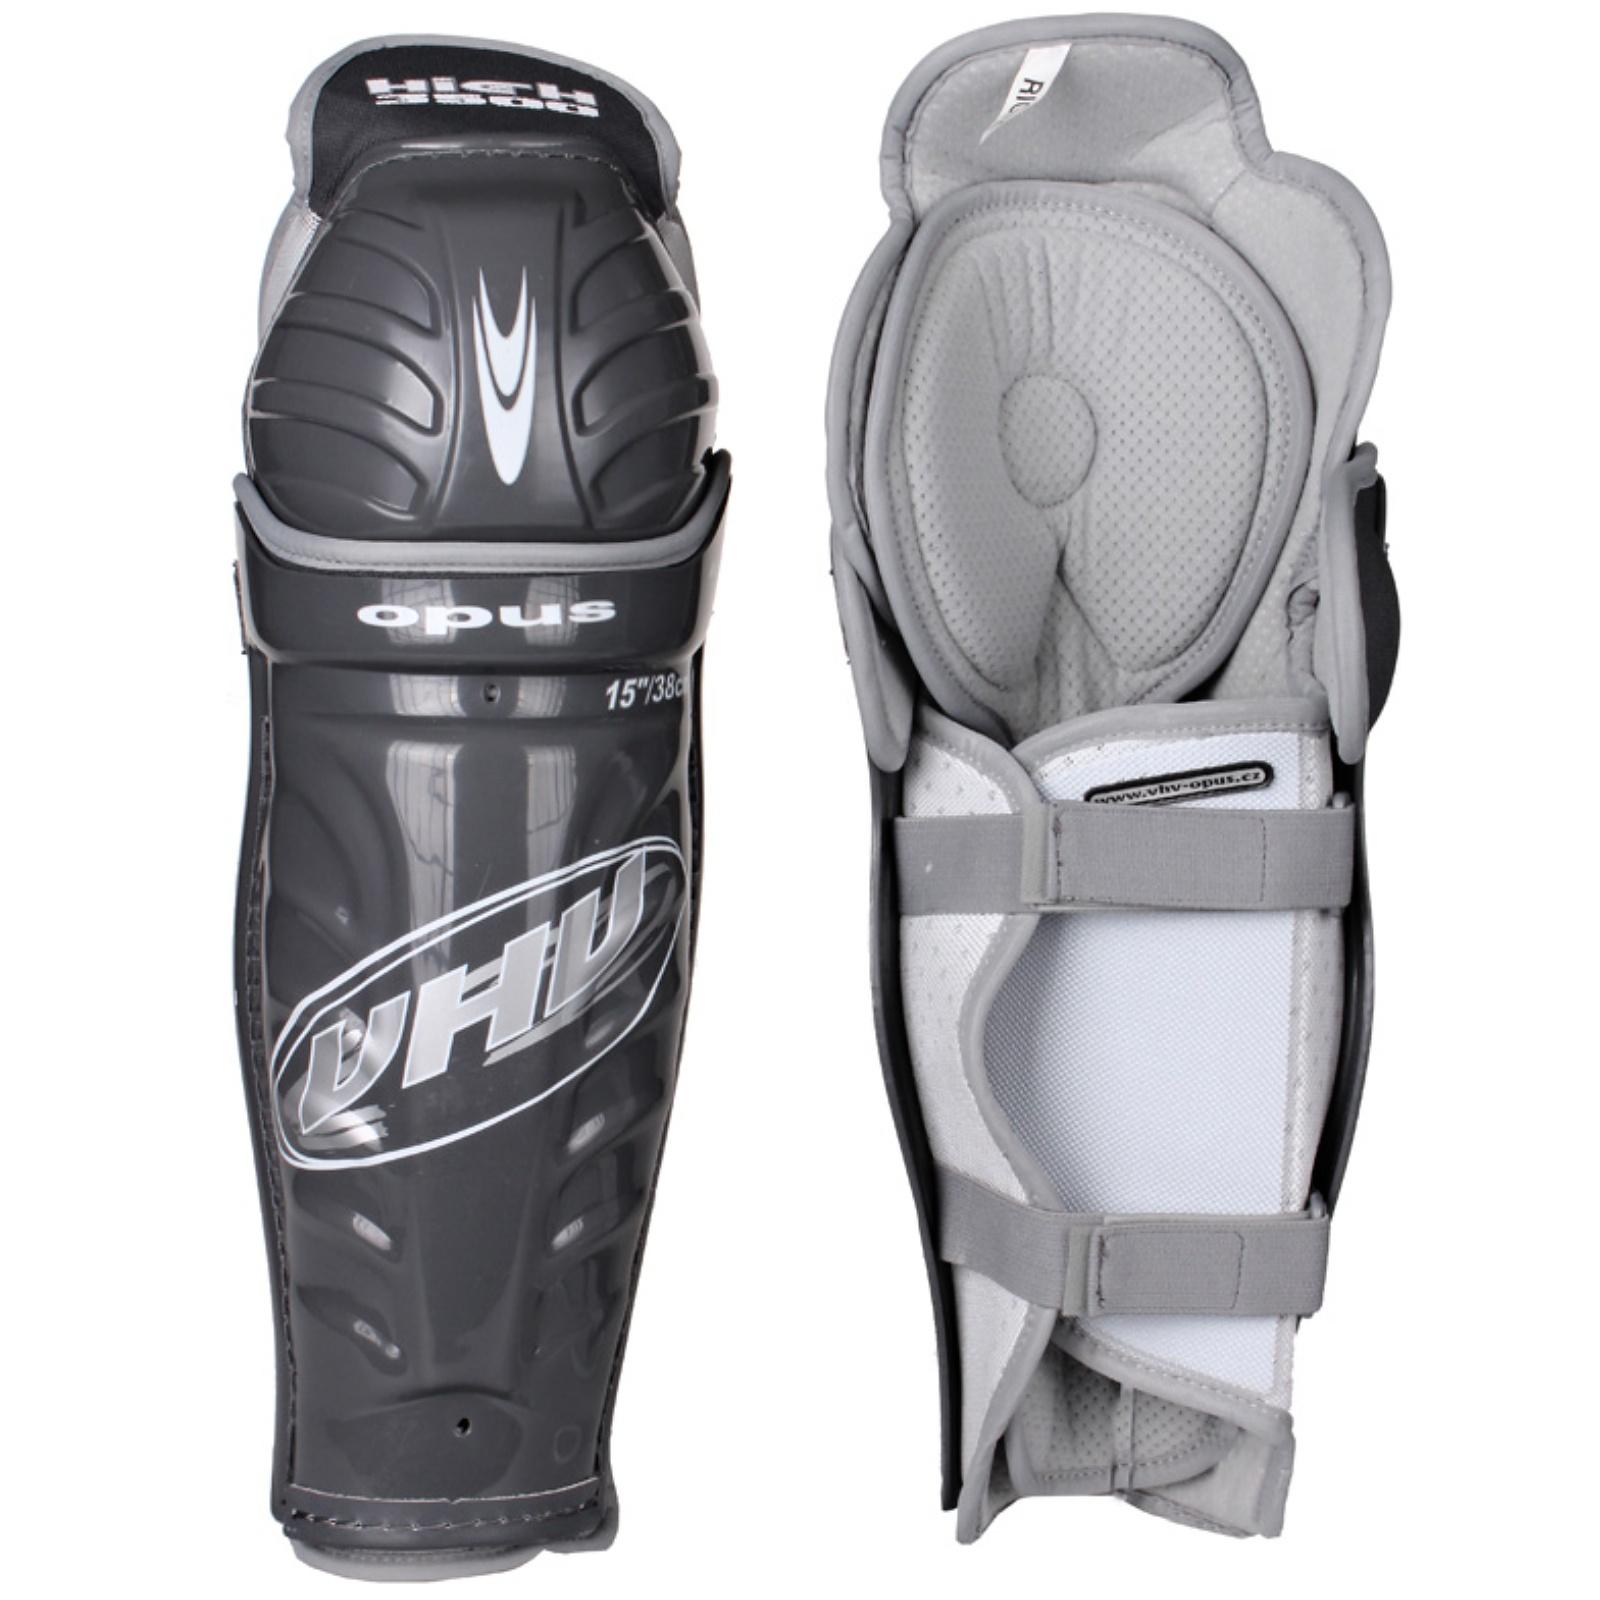 Hokejový chránič holení OPUS 3694 High 3500 SR - vel. 14''